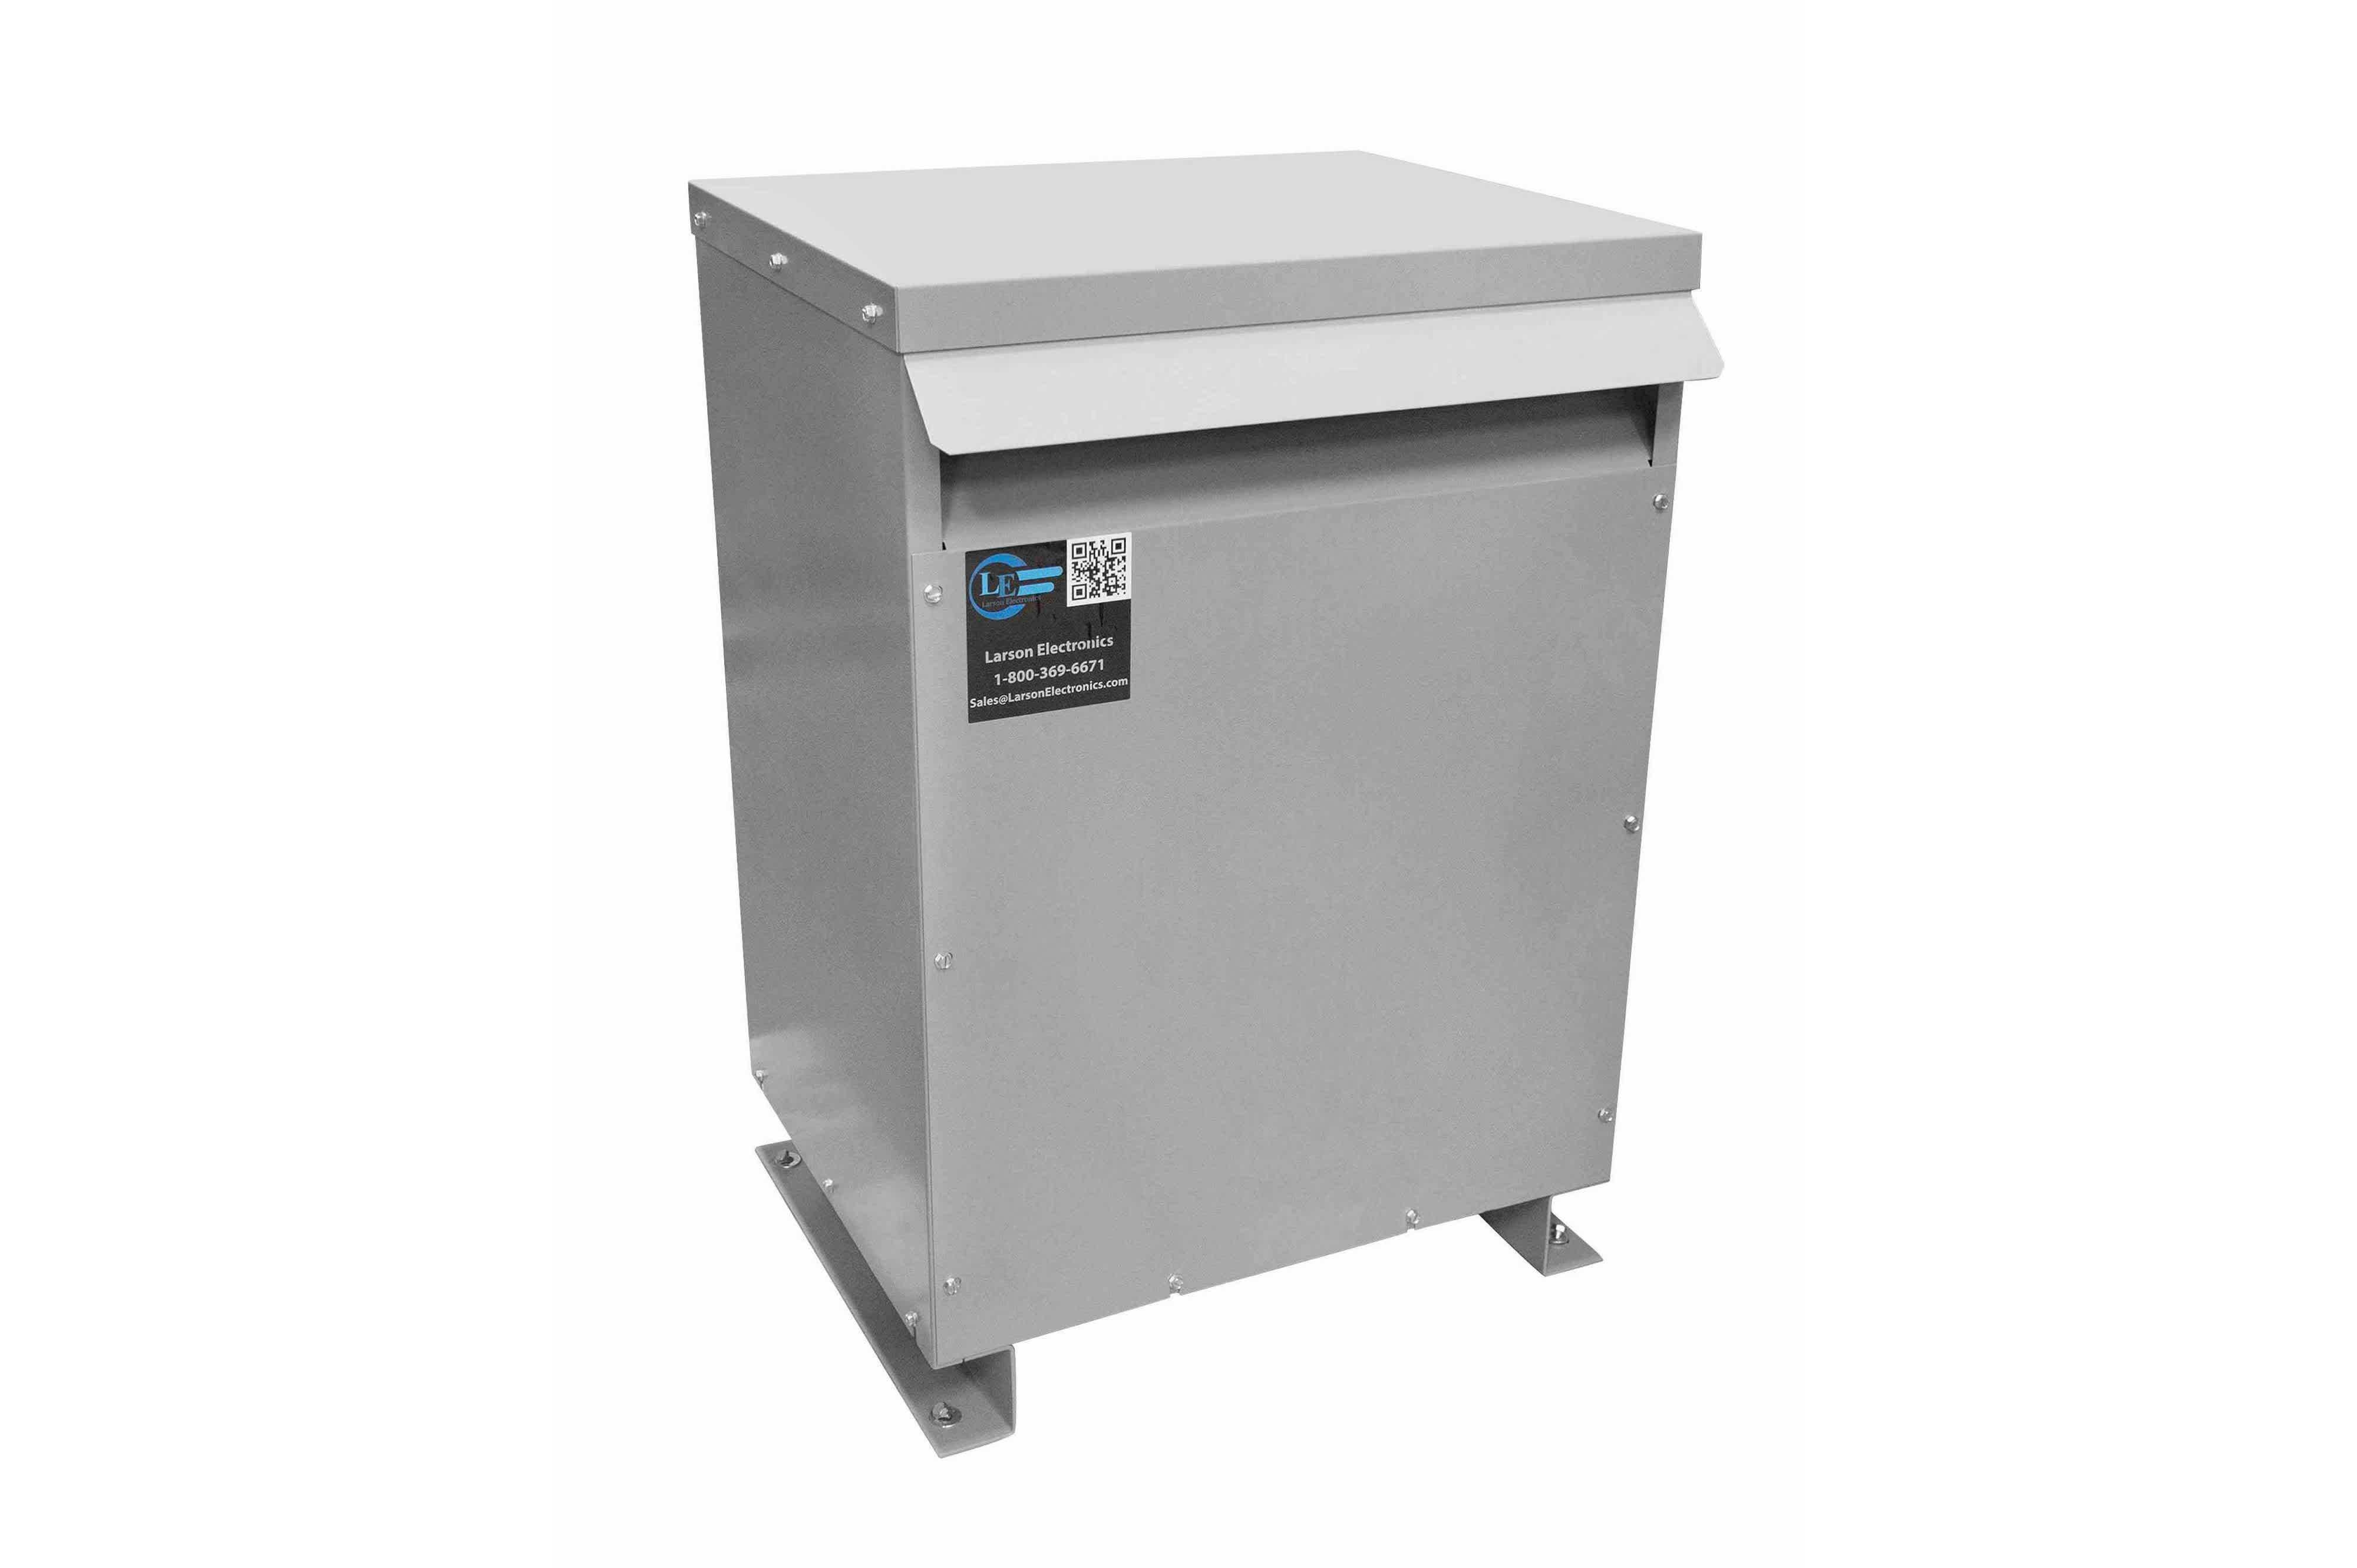 70 kVA 3PH Isolation Transformer, 600V Wye Primary, 480V Delta Secondary, N3R, Ventilated, 60 Hz